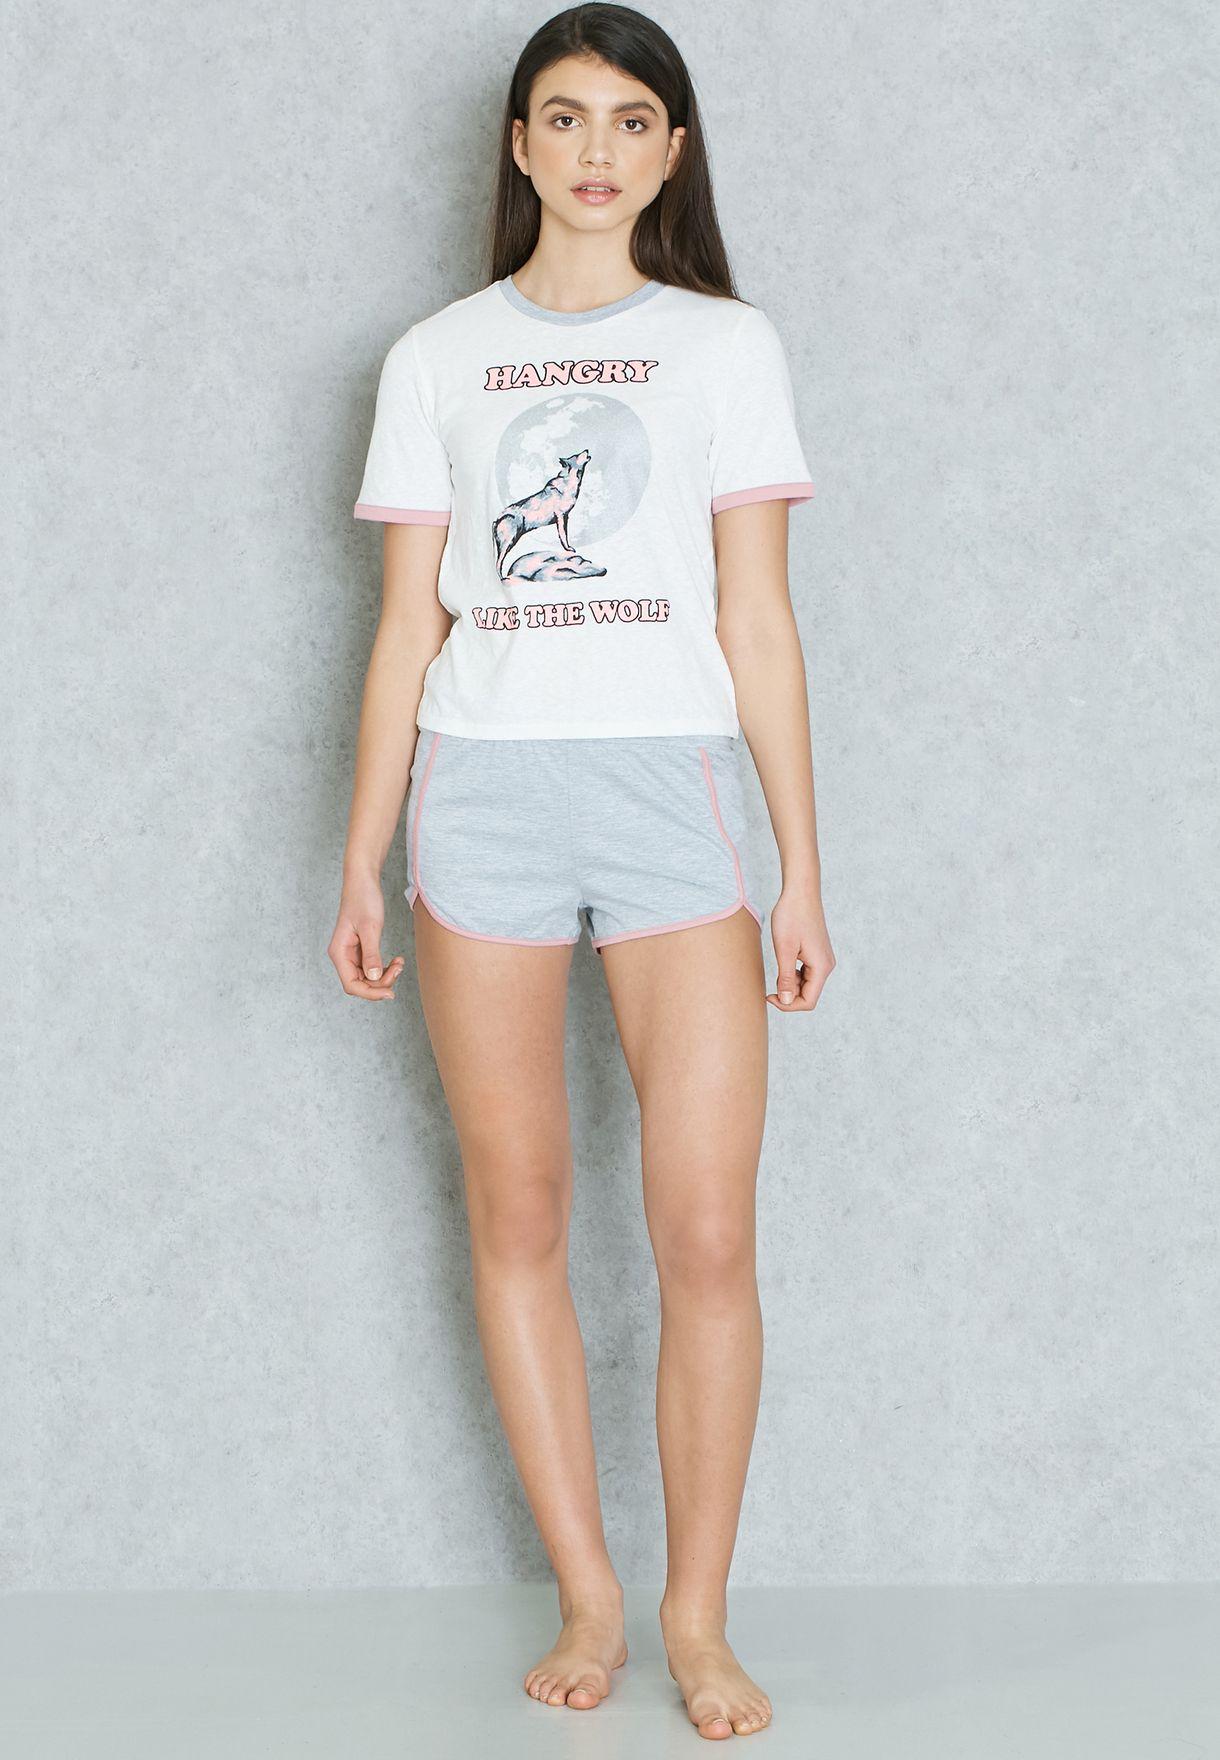 9fba639ea09 Slogan T Shirts Topshop - BCD Tofu House